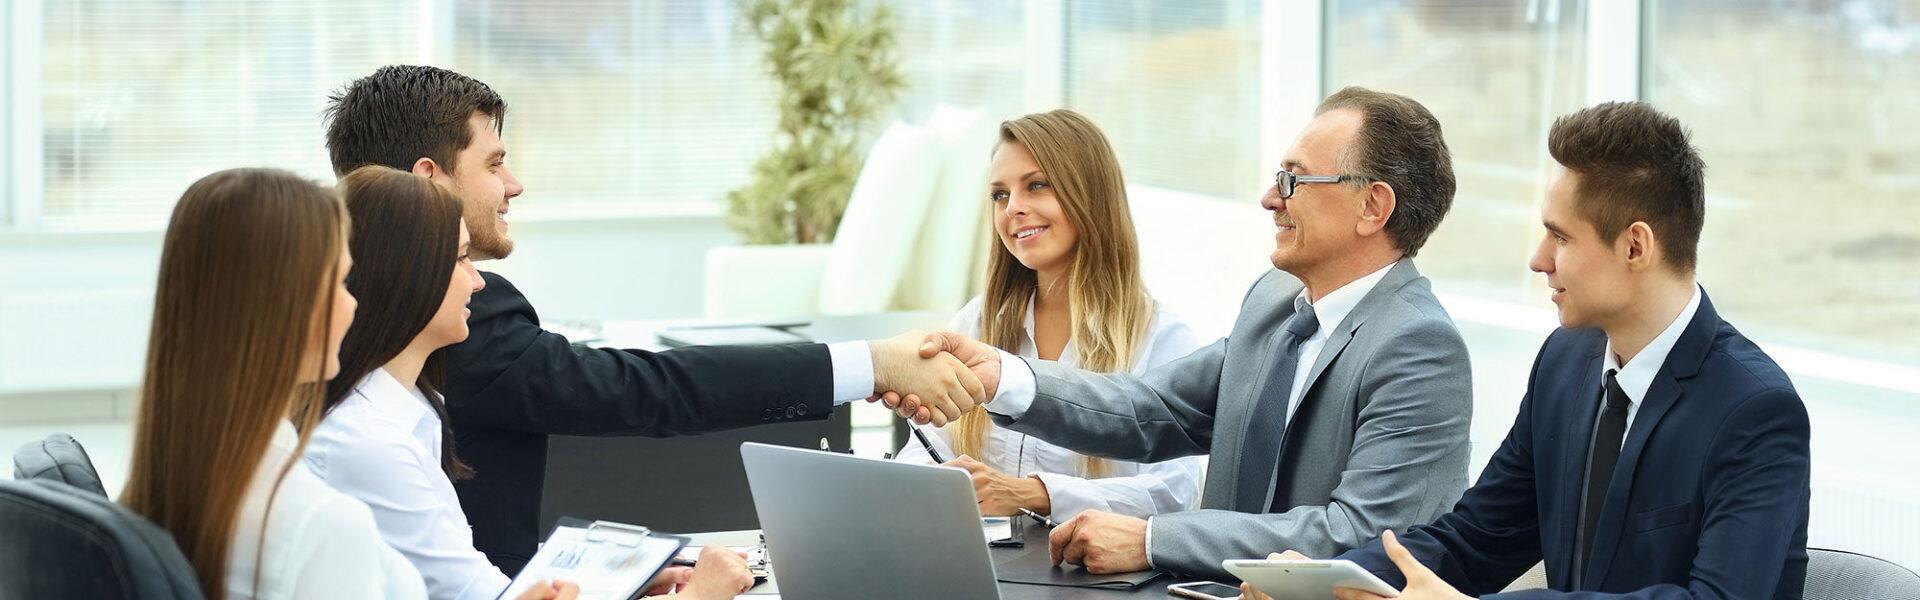 The Buyer/Seller Meeting